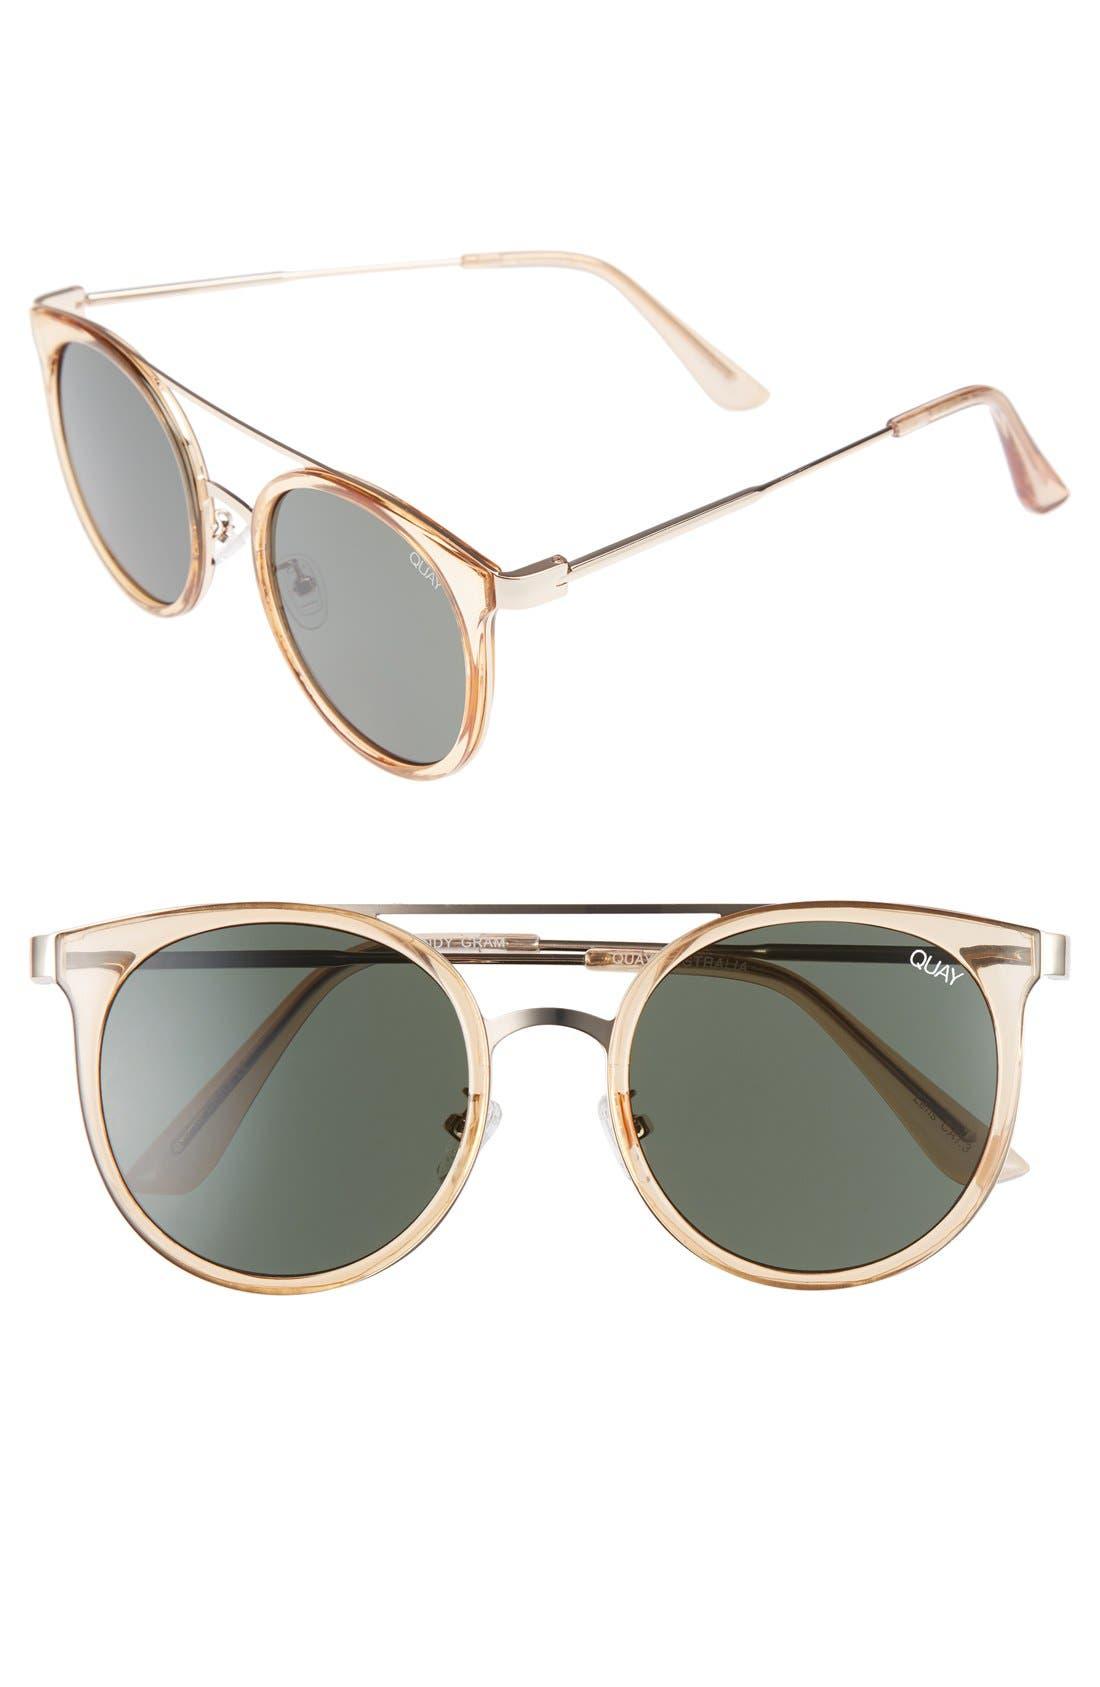 Kandy Gram 51mm Round Sunglasses,                         Main,                         color, 310